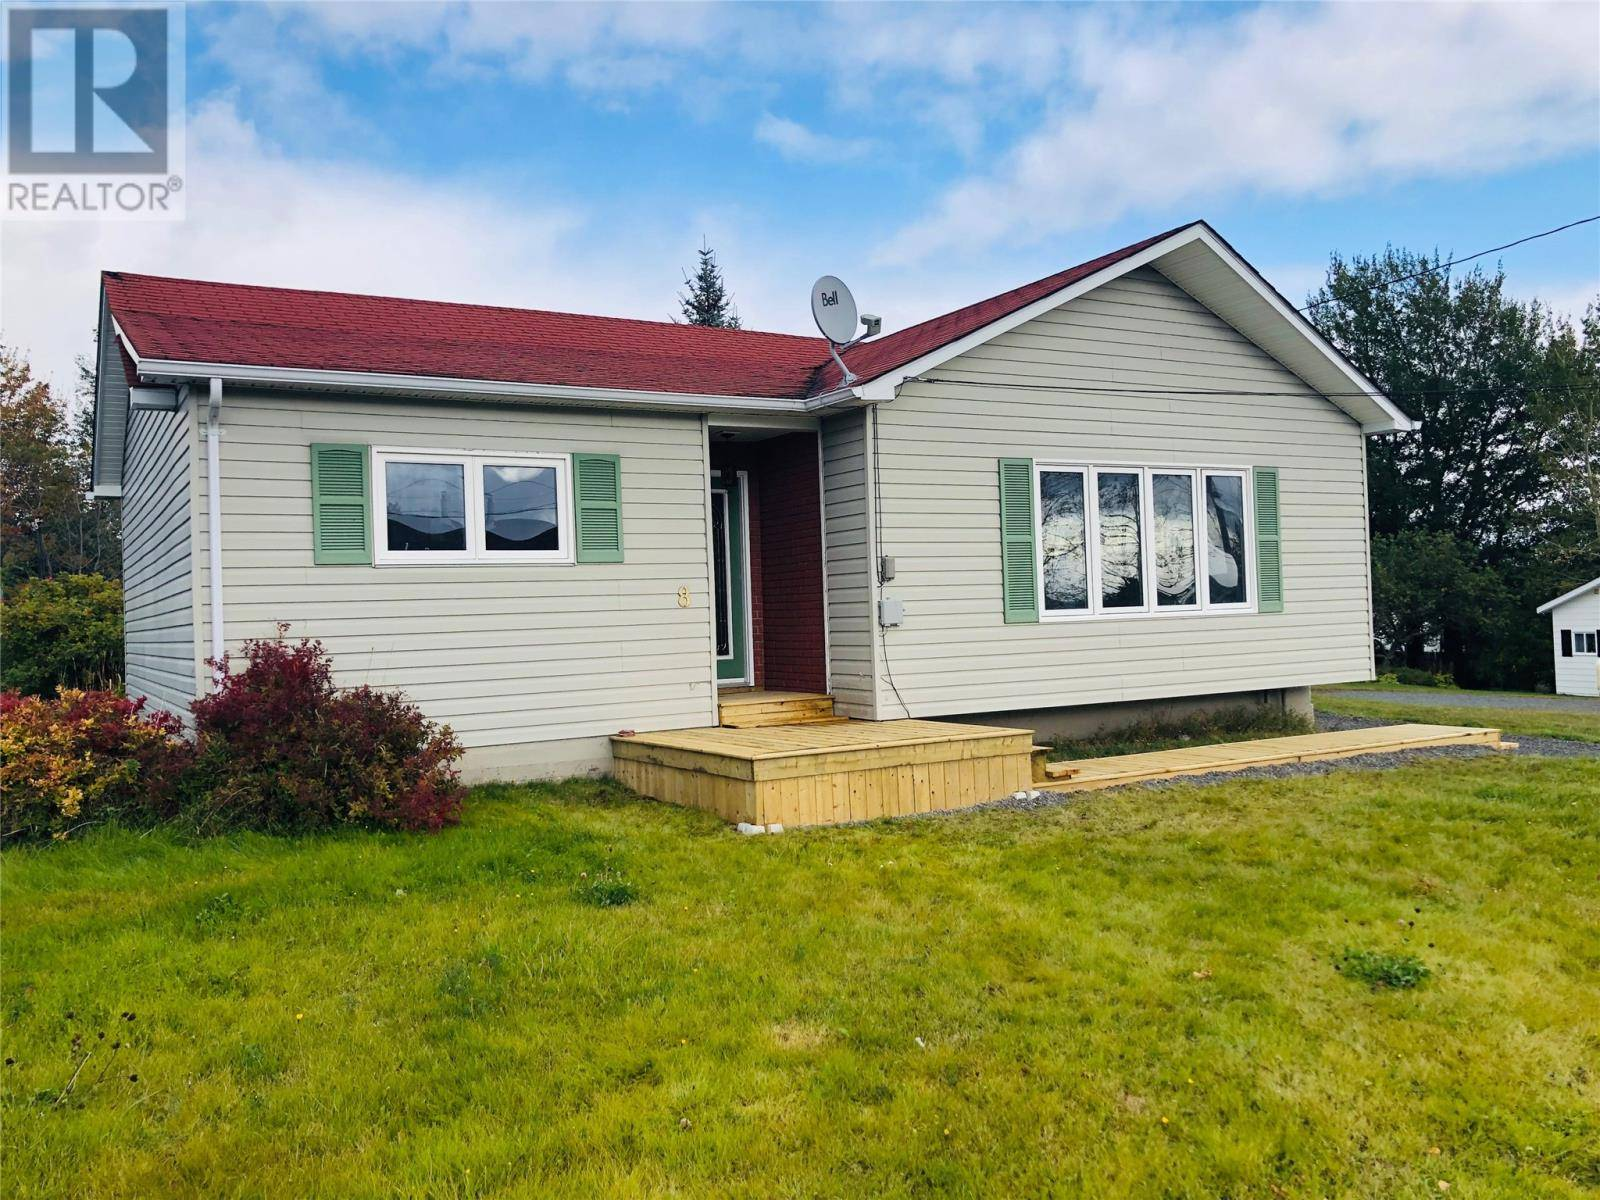 House for sale at 8 Dildo St Lewisporte Newfoundland - MLS: 1197995